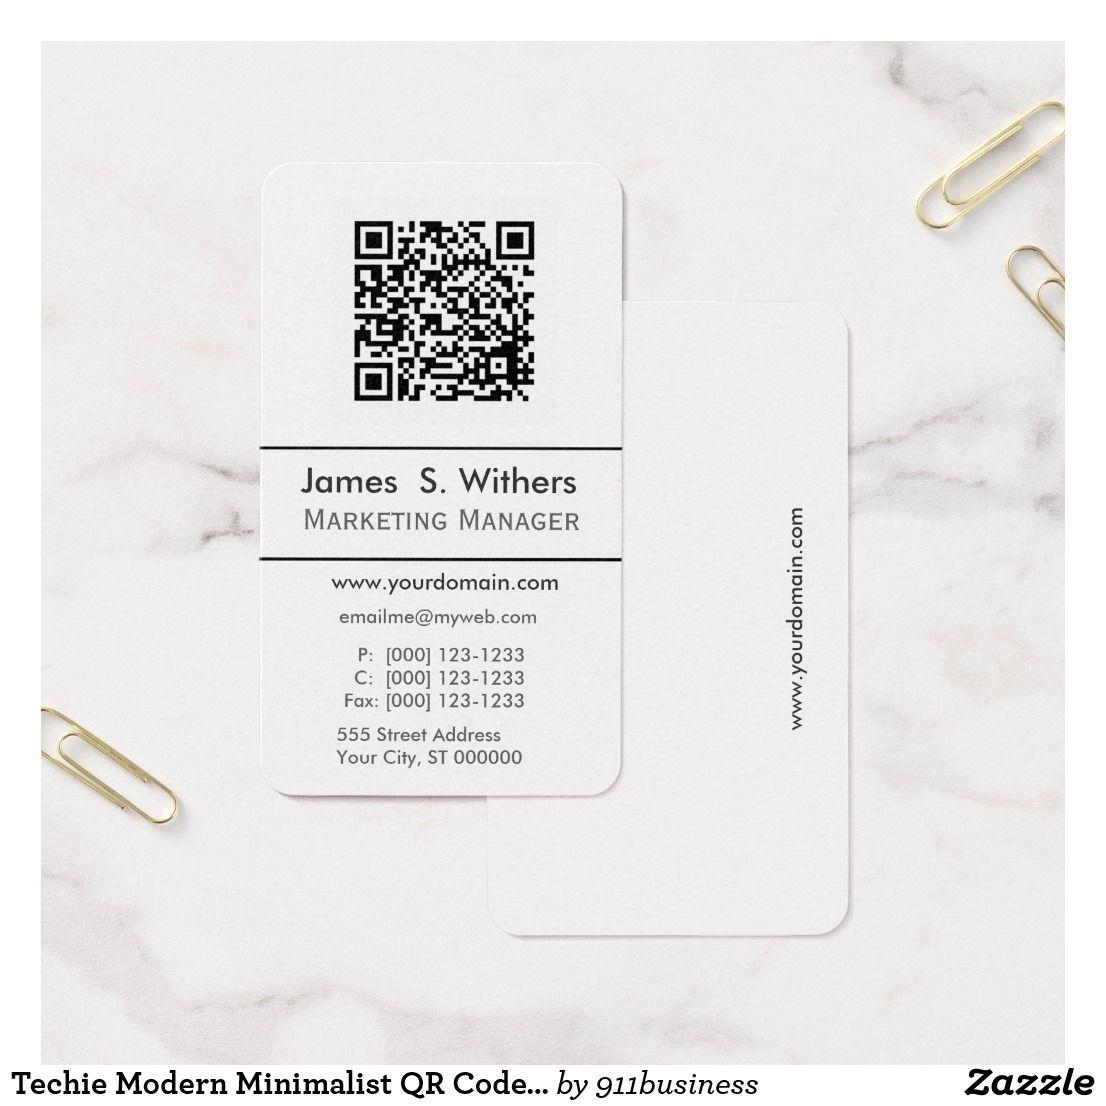 Techie Modern Minimalist Qr Code Photo Logo Business Card Zazzle Com Qr Code Business Card Business Card Logo Photo Logo